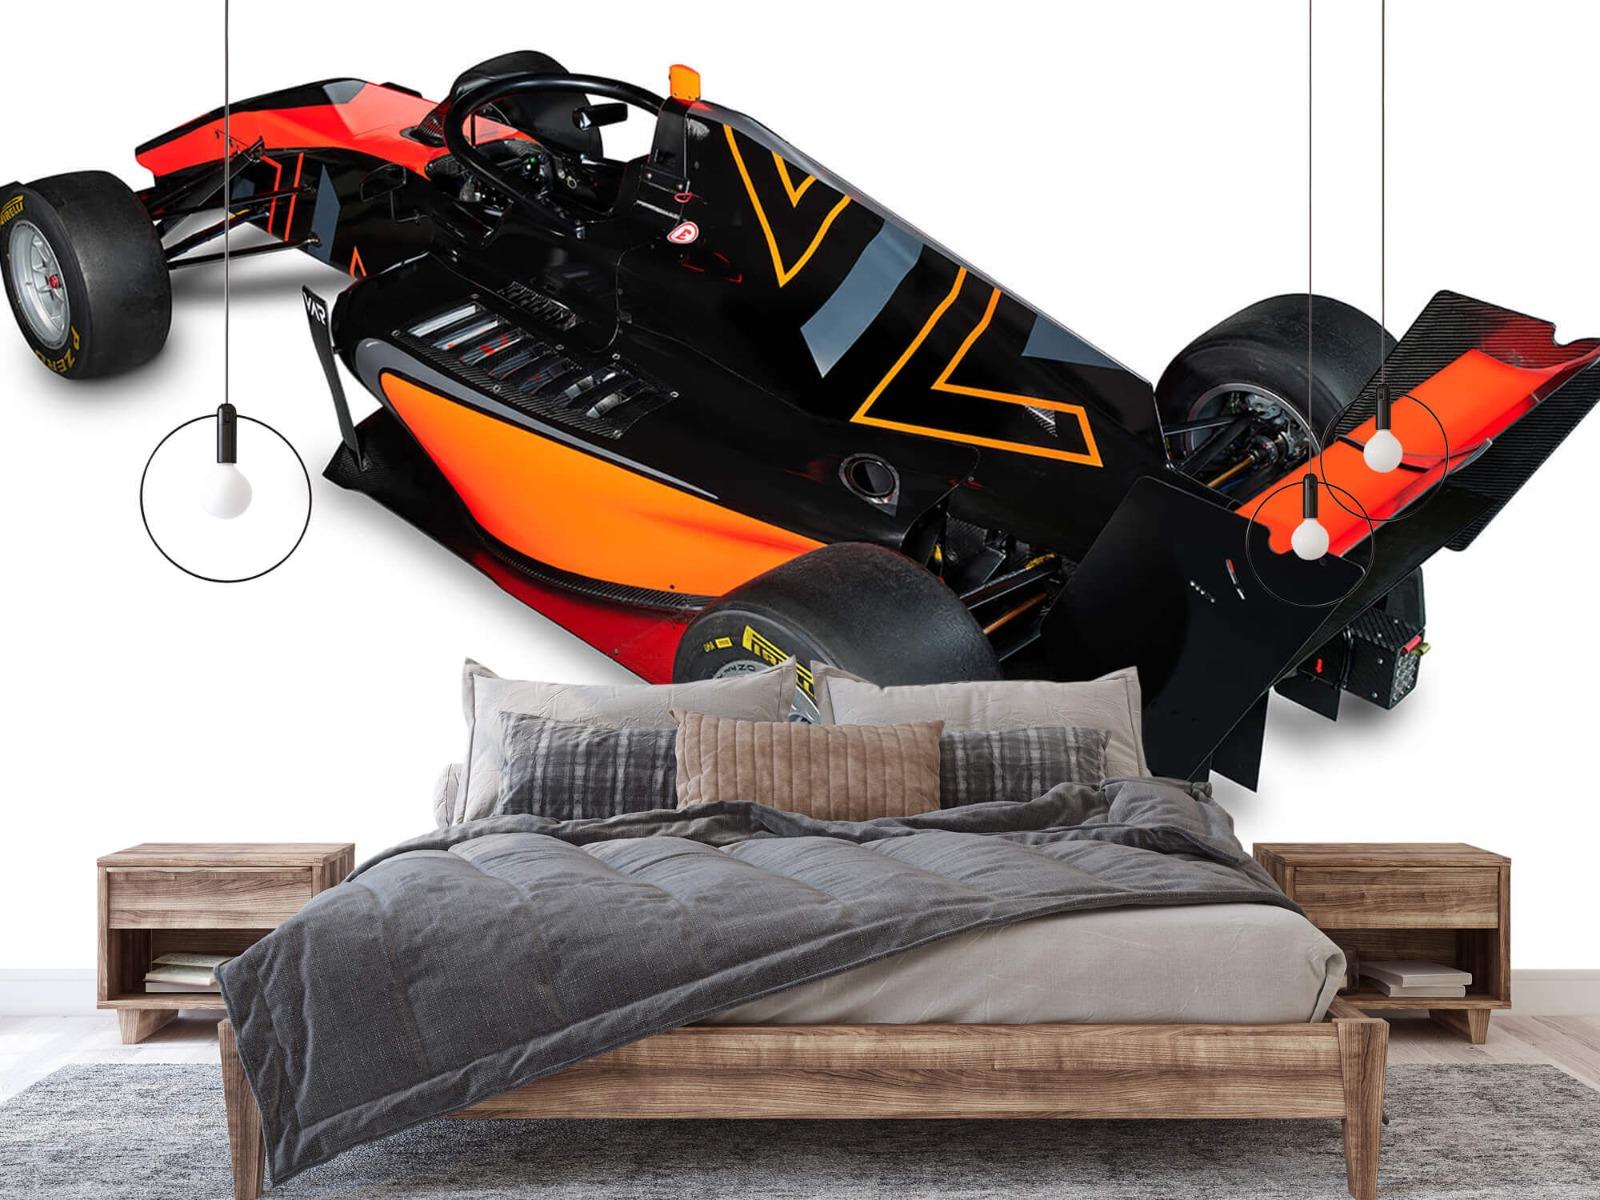 Sportauto's - Formula 3 - Rear left view - Hobbykamer 2